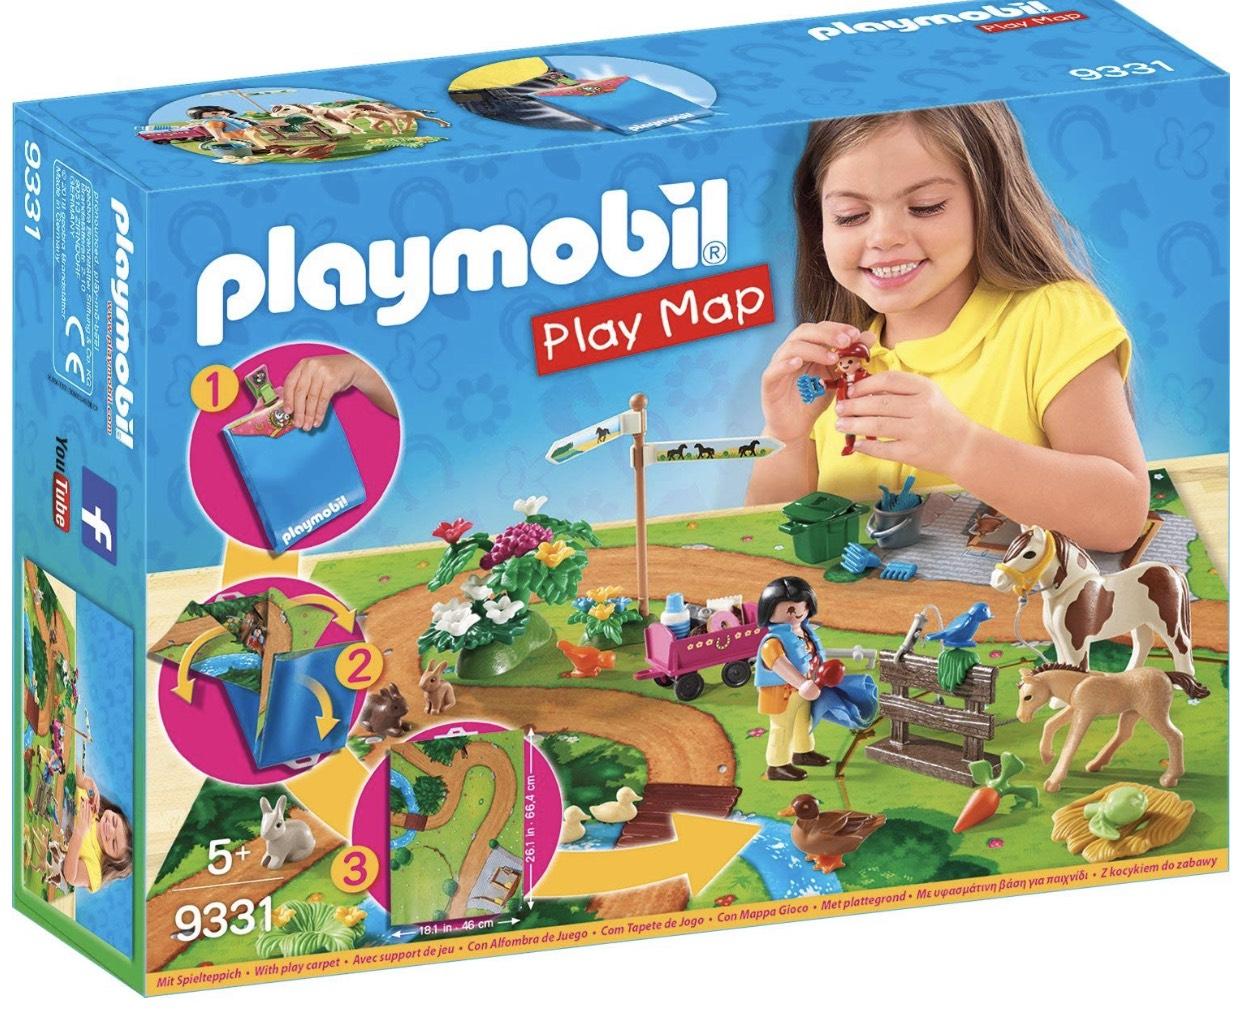 Playmobil 9331 - Ponyausflugset